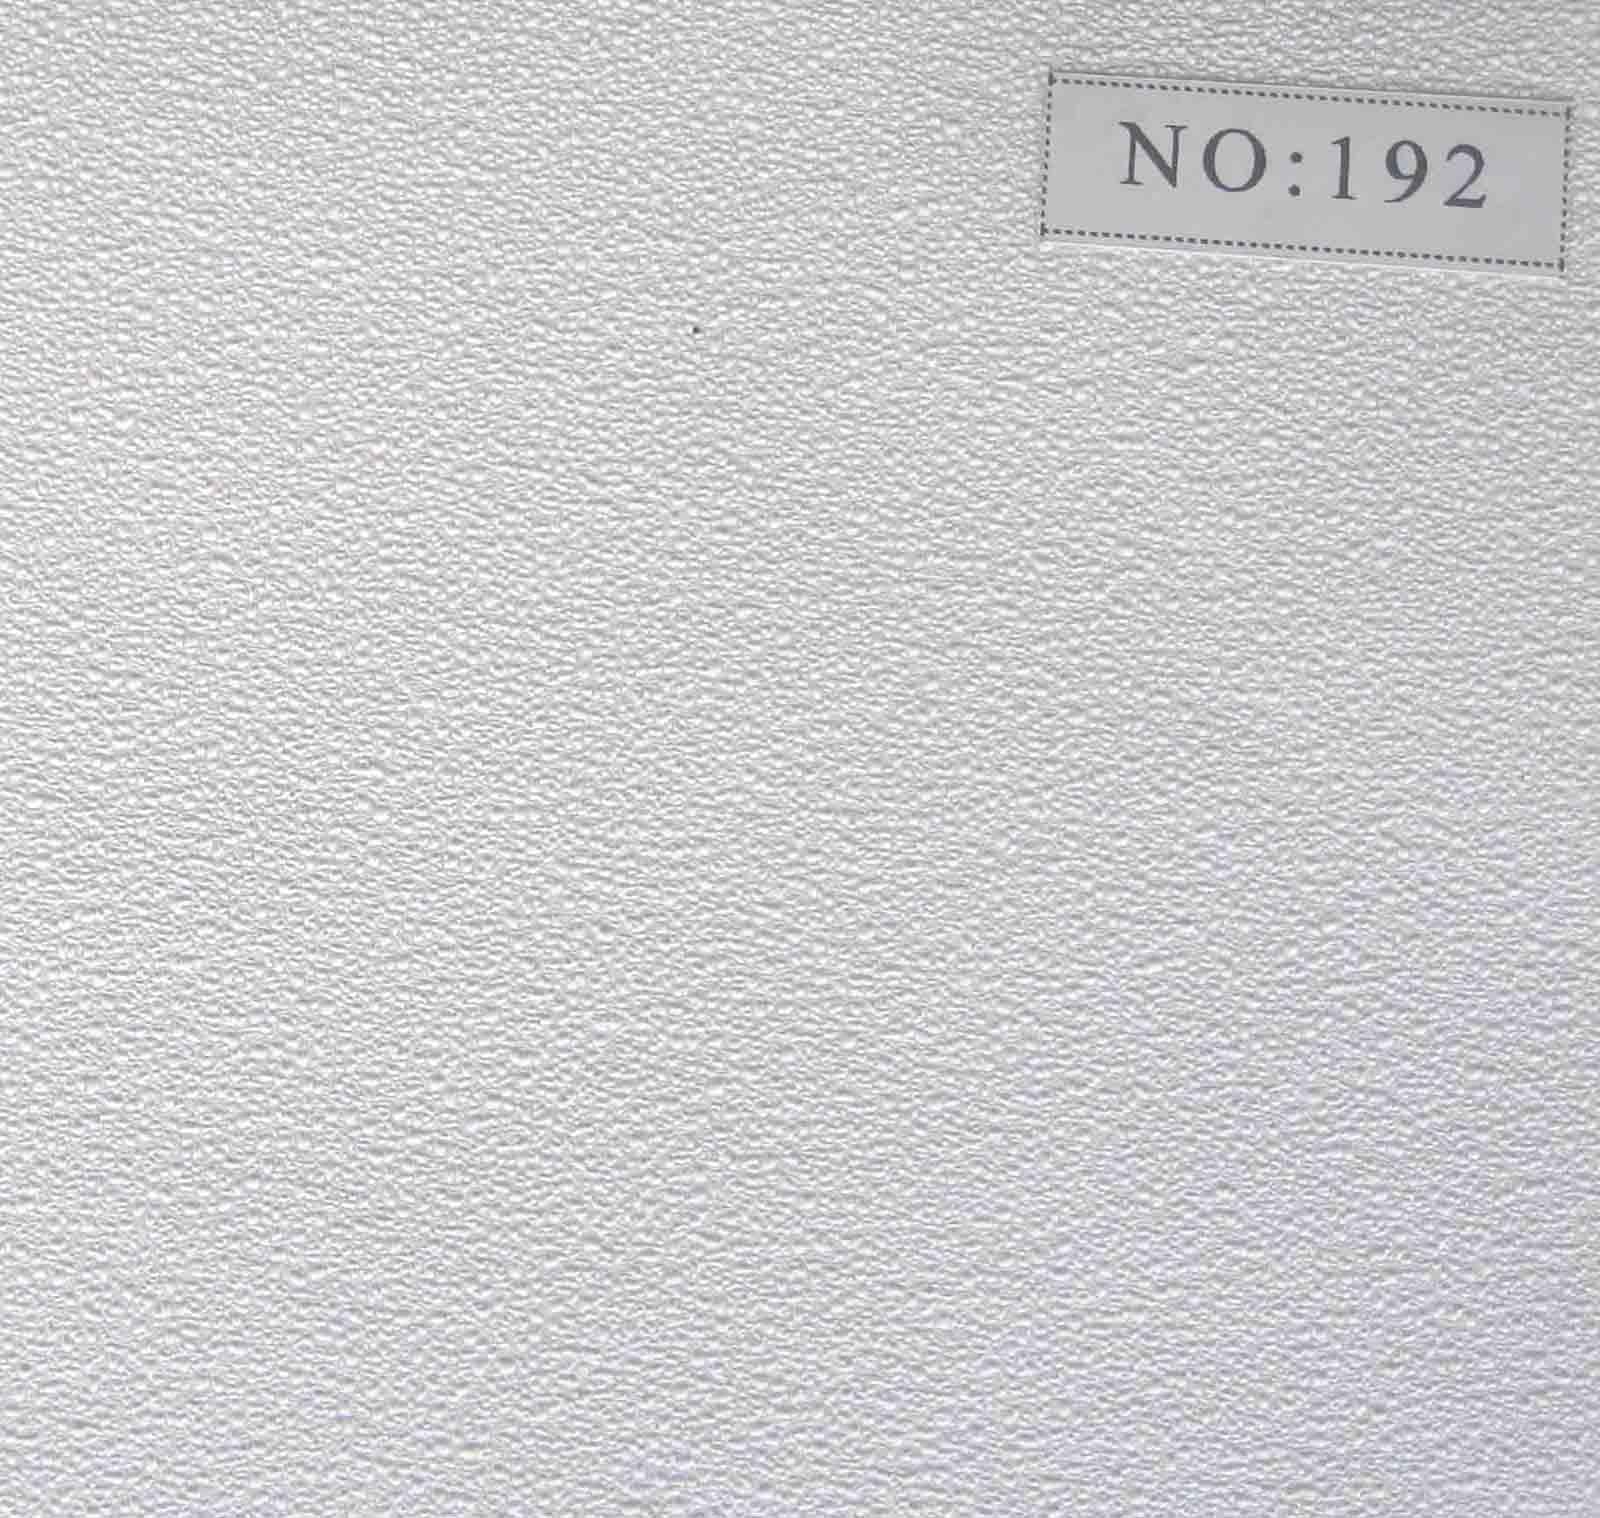 Pvc laminated gypsum ceiling tiles manufacturers websitevarnicorporation dailygadgetfo Gallery